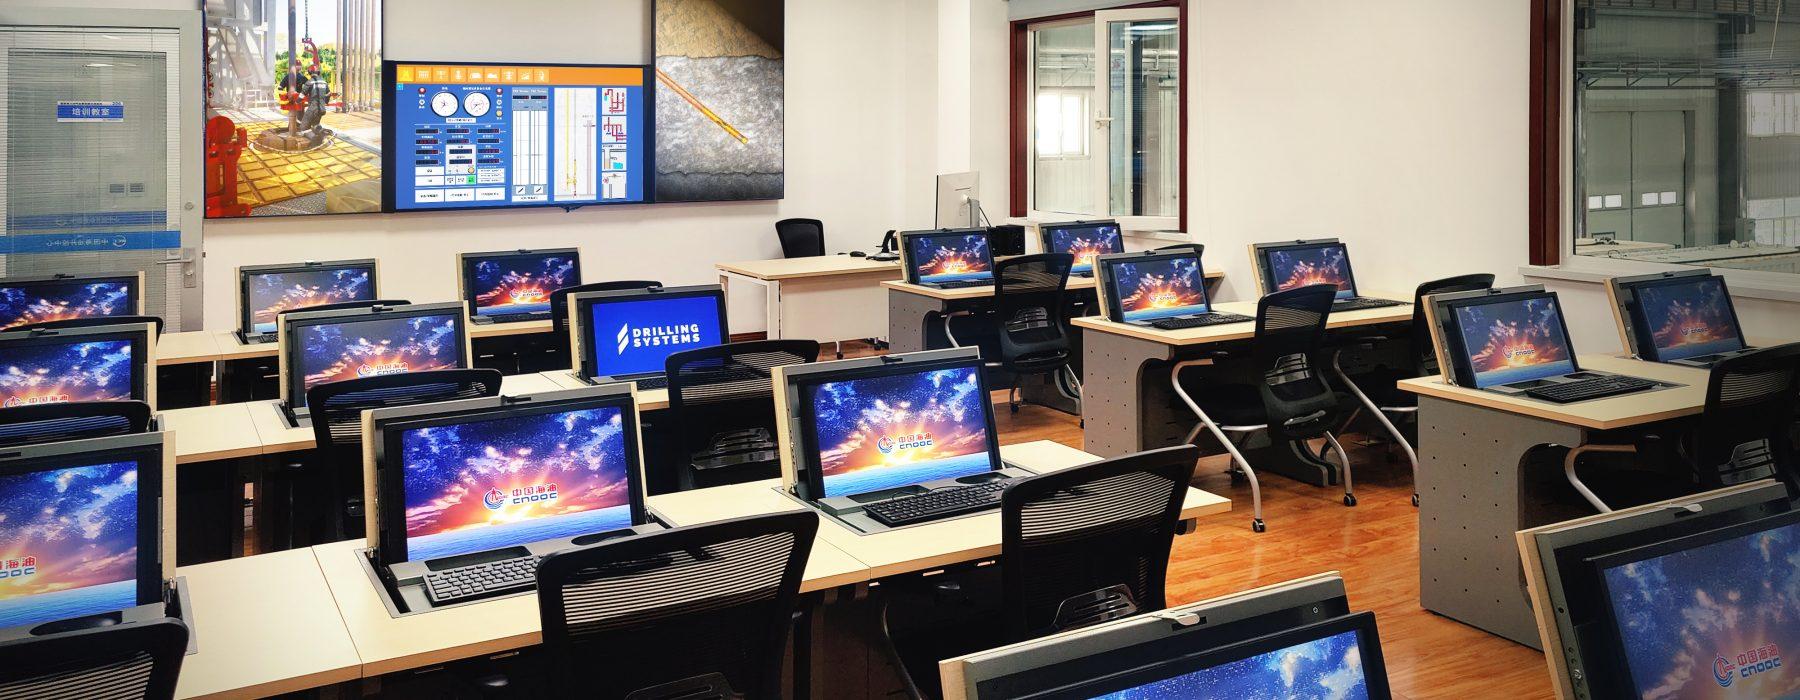 DrillSIM:Educator setup a CNOOC's Well Control Center